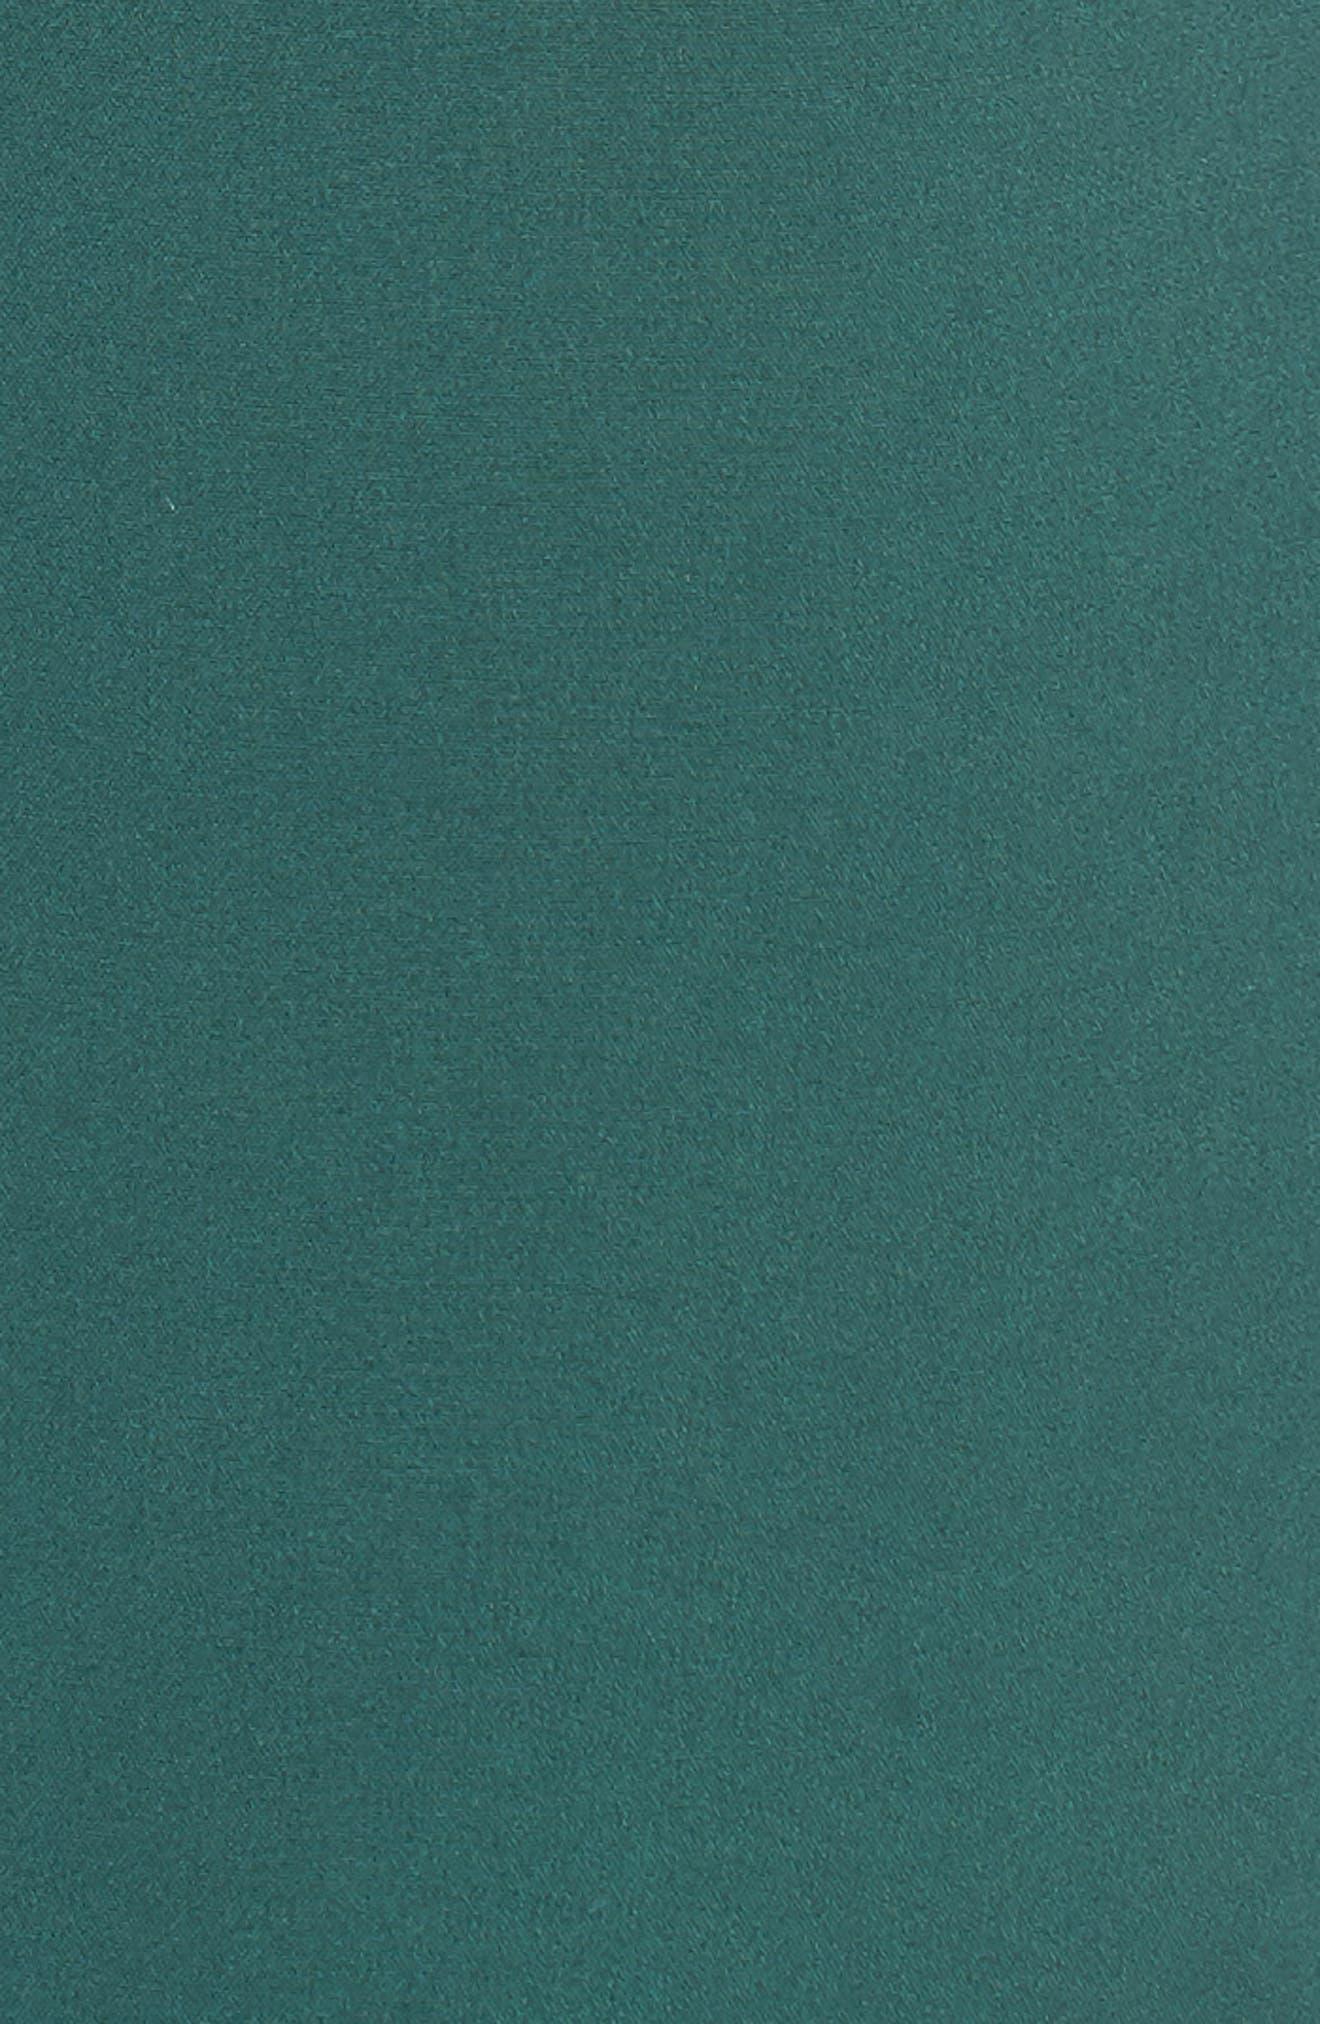 Popover Midi Dress,                             Alternate thumbnail 5, color,                             Emerald